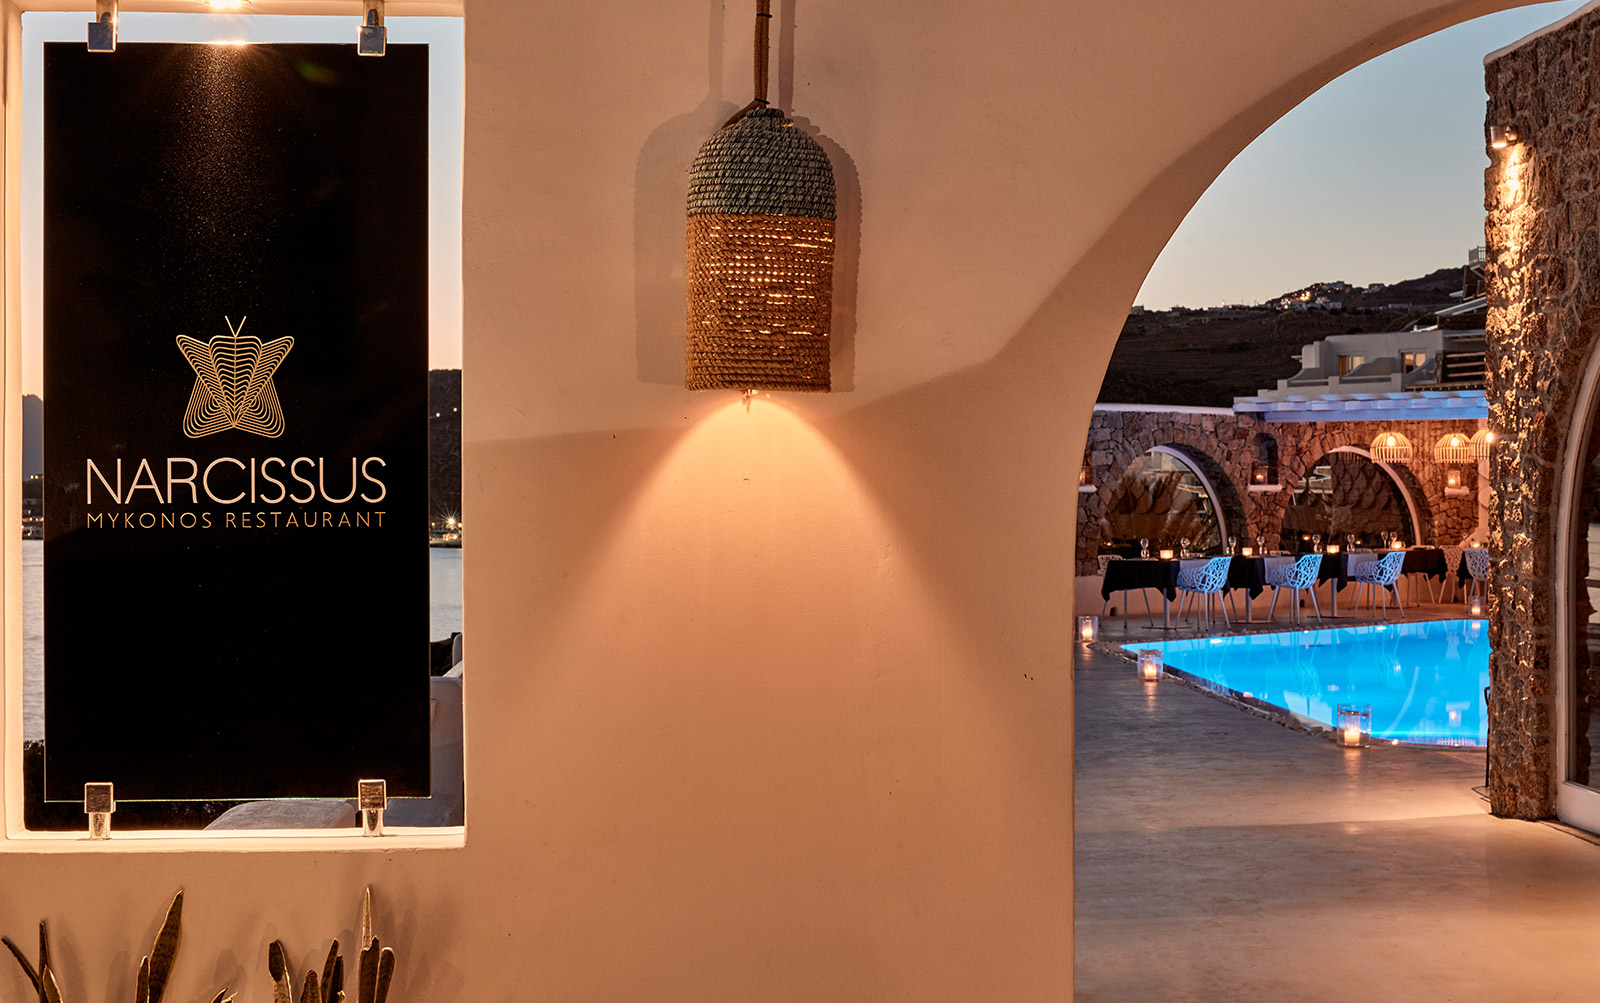 mykonos-restaurant-narcissus-a